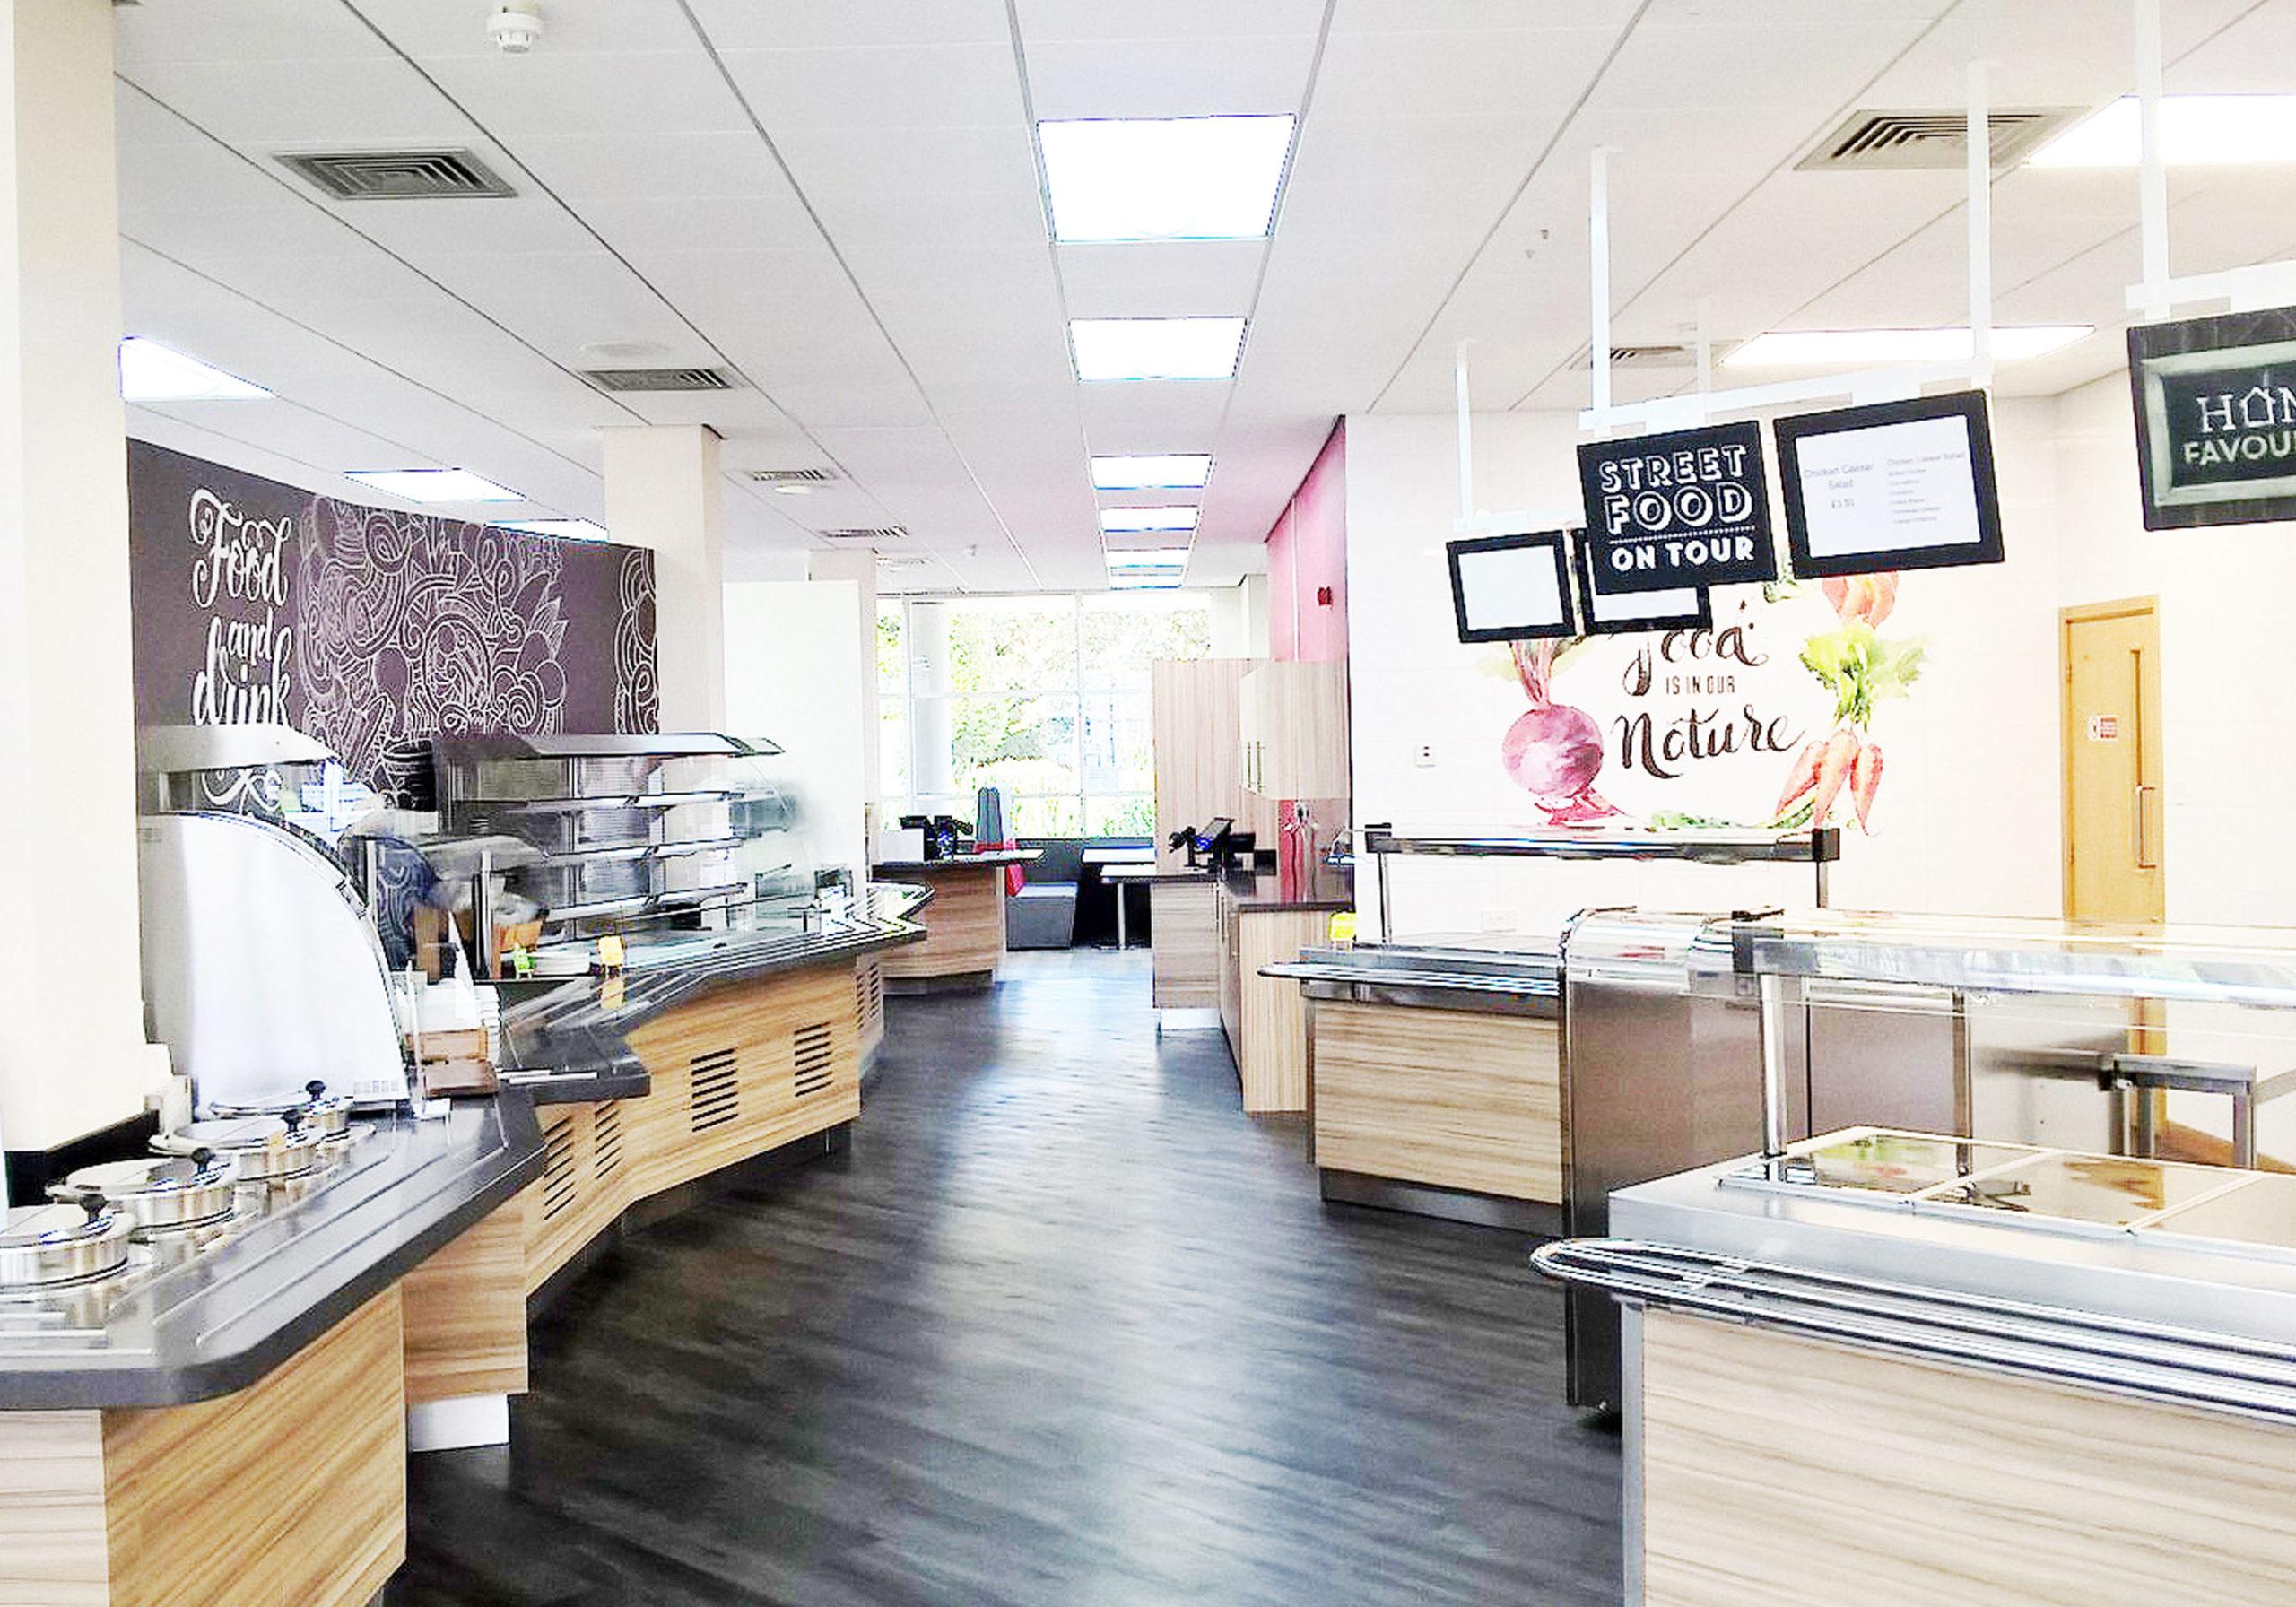 Nebrak Foodservice Area Interior